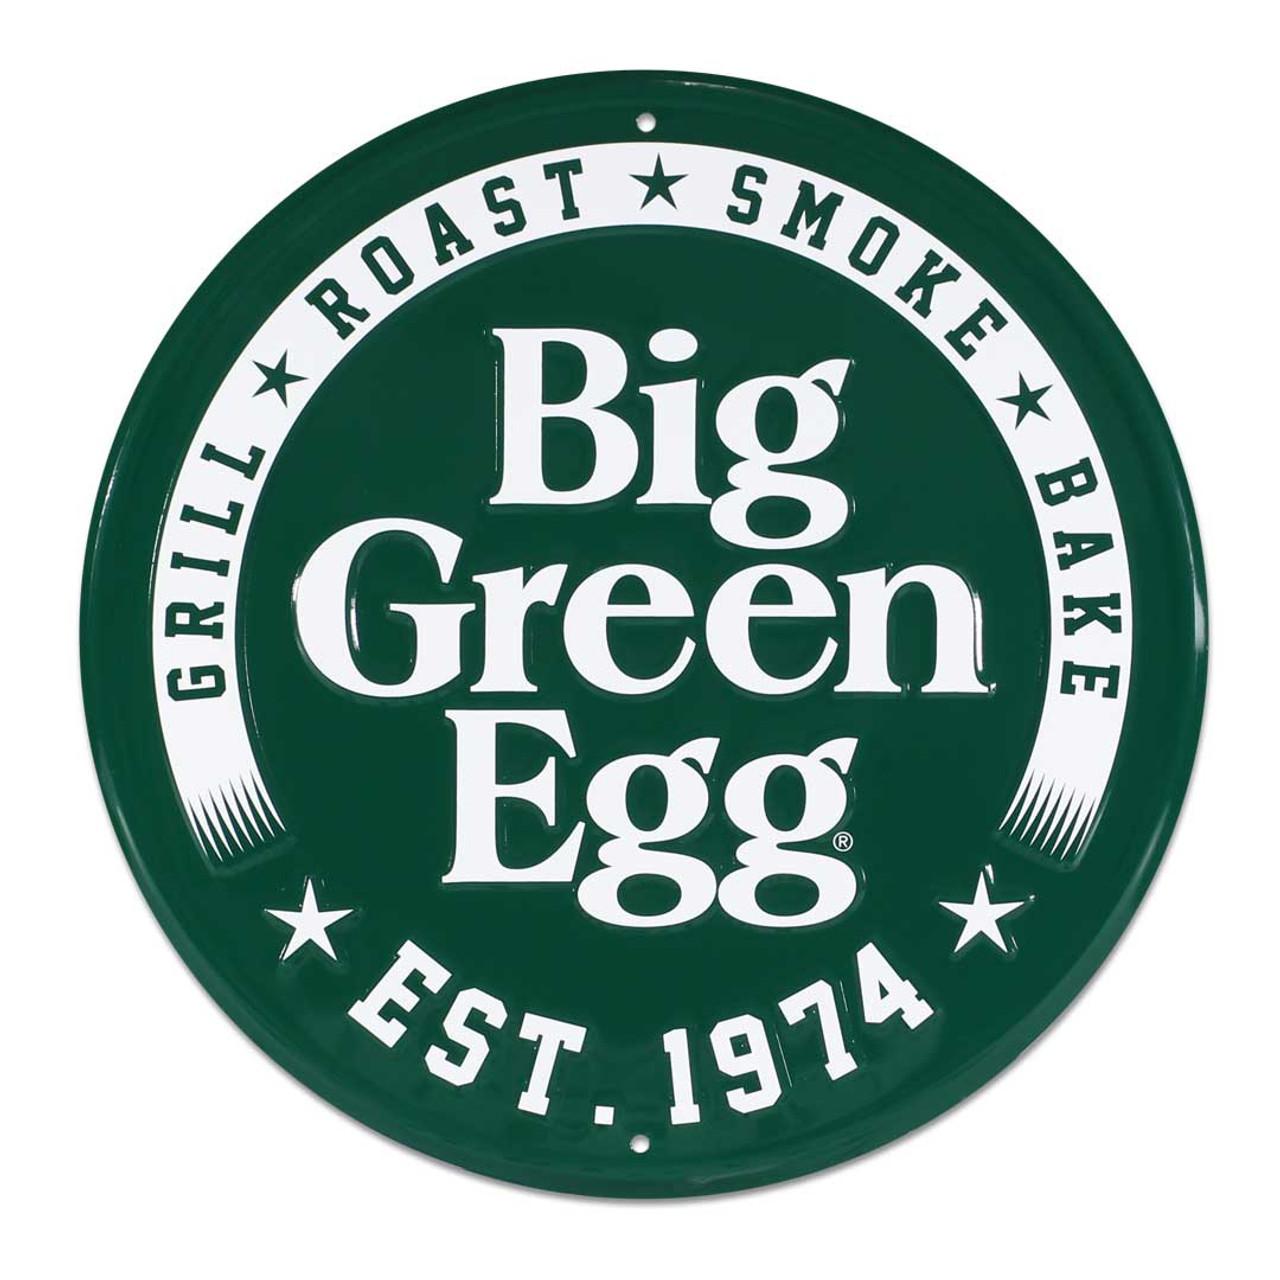 Round Stamped Aluminum Est. 1974 Sign, Green Big Green Egg Sign